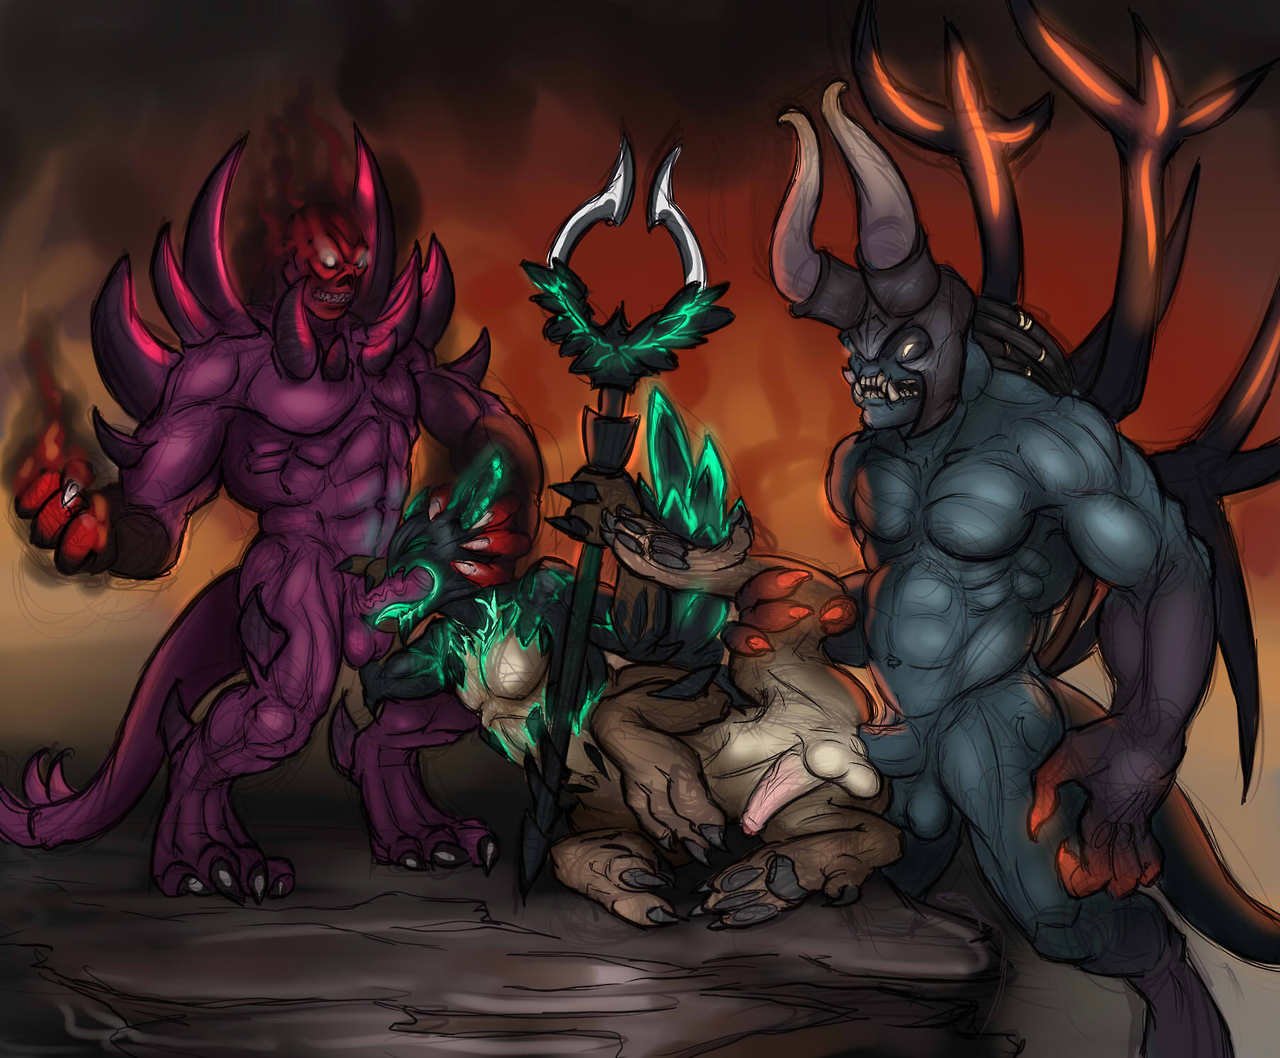 journey] - likkezg's journeyboi [the Dark souls 3 capra demon